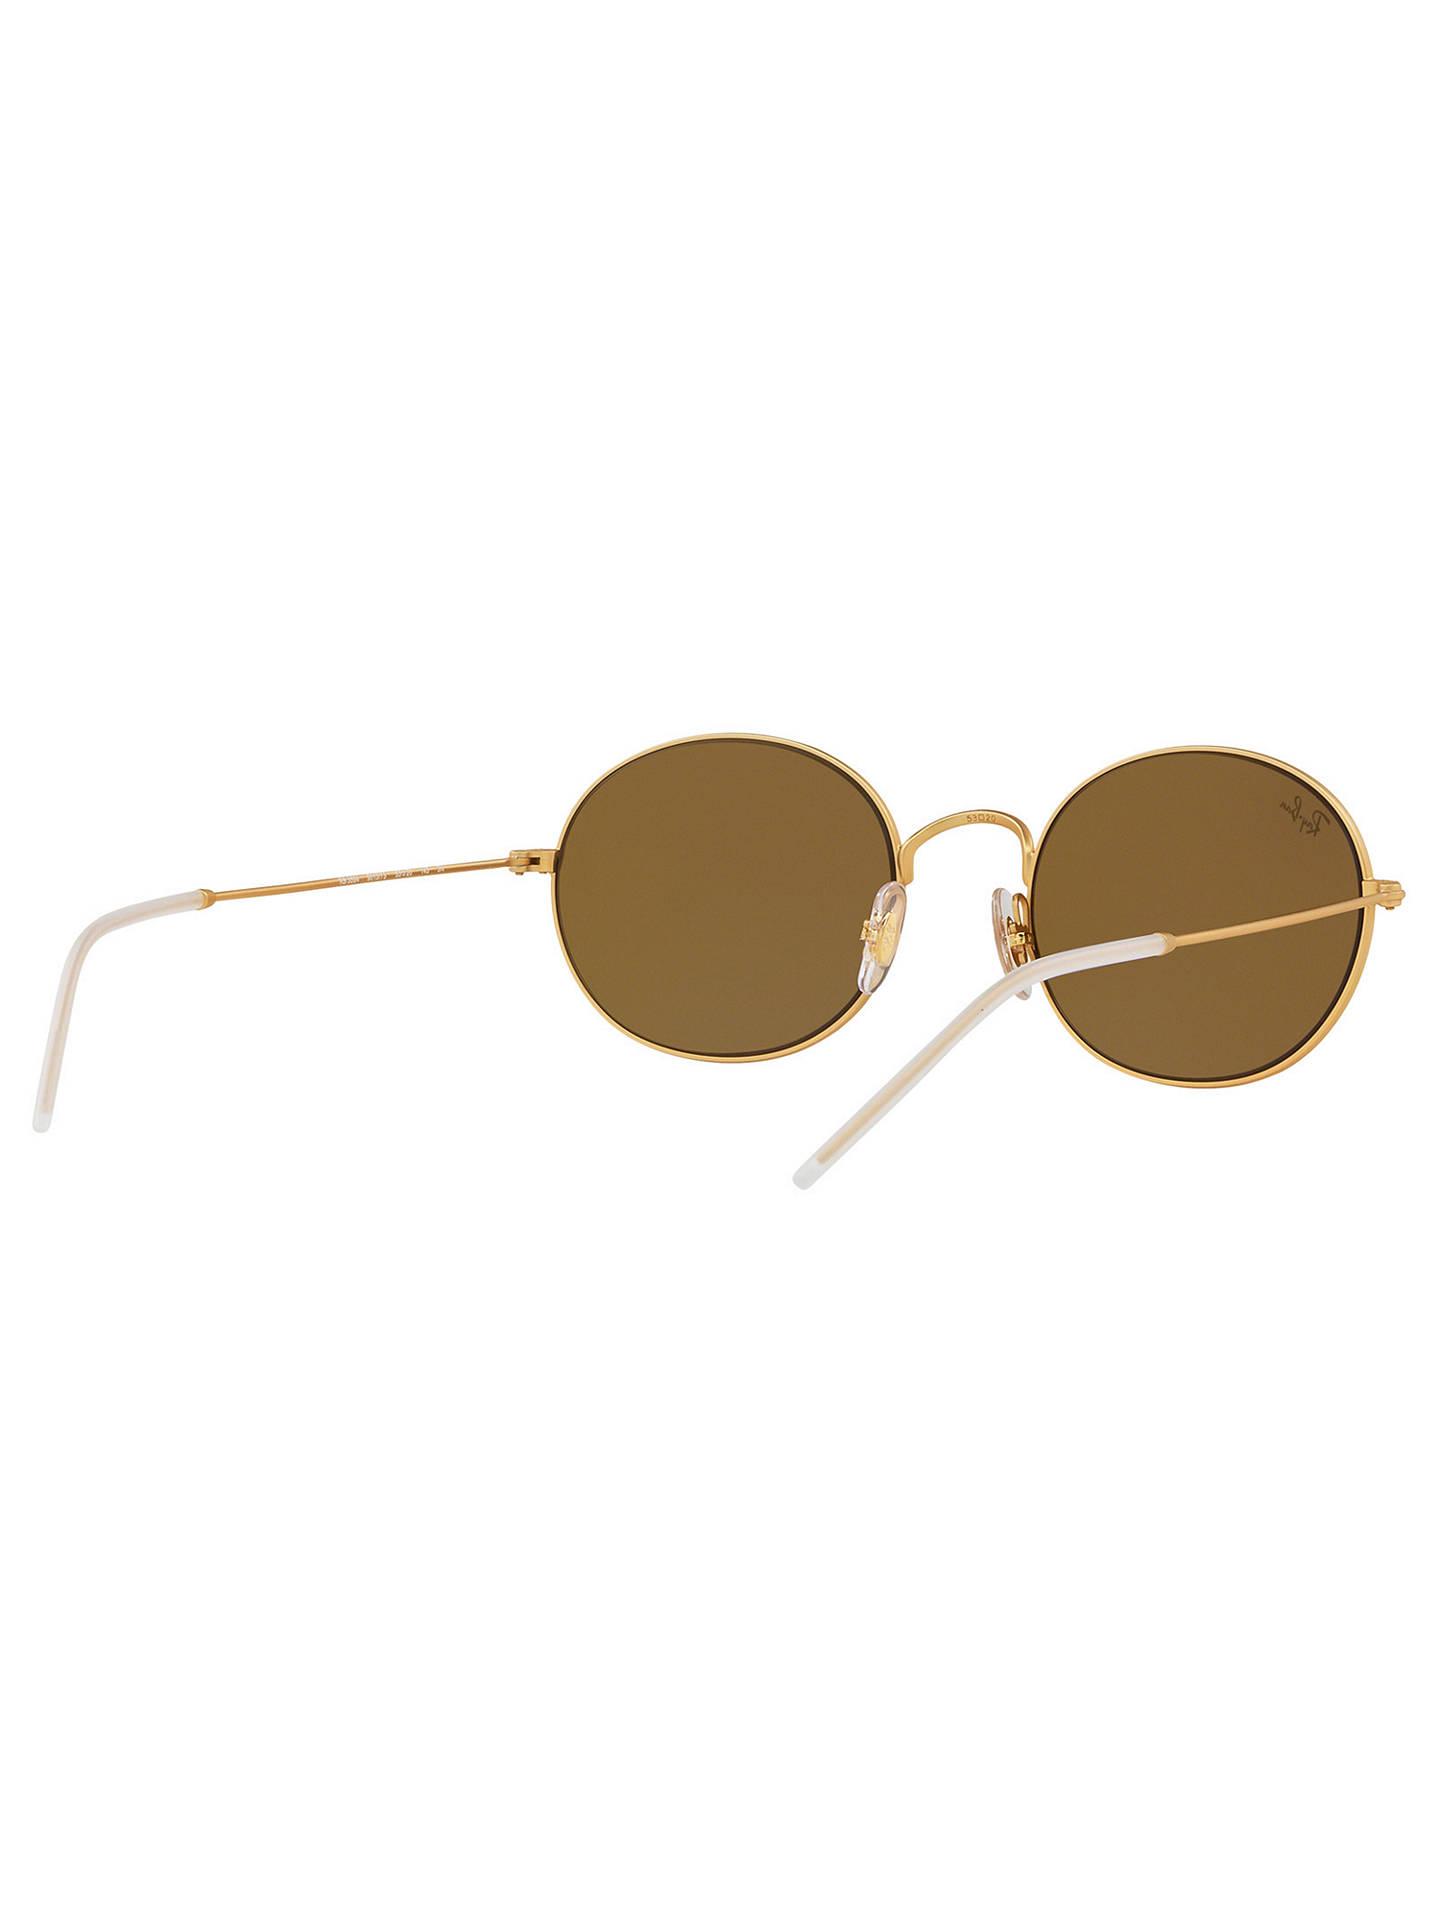 664b3b97247 Buy Ray-Ban RB3594 Unisex Round Sunglasses